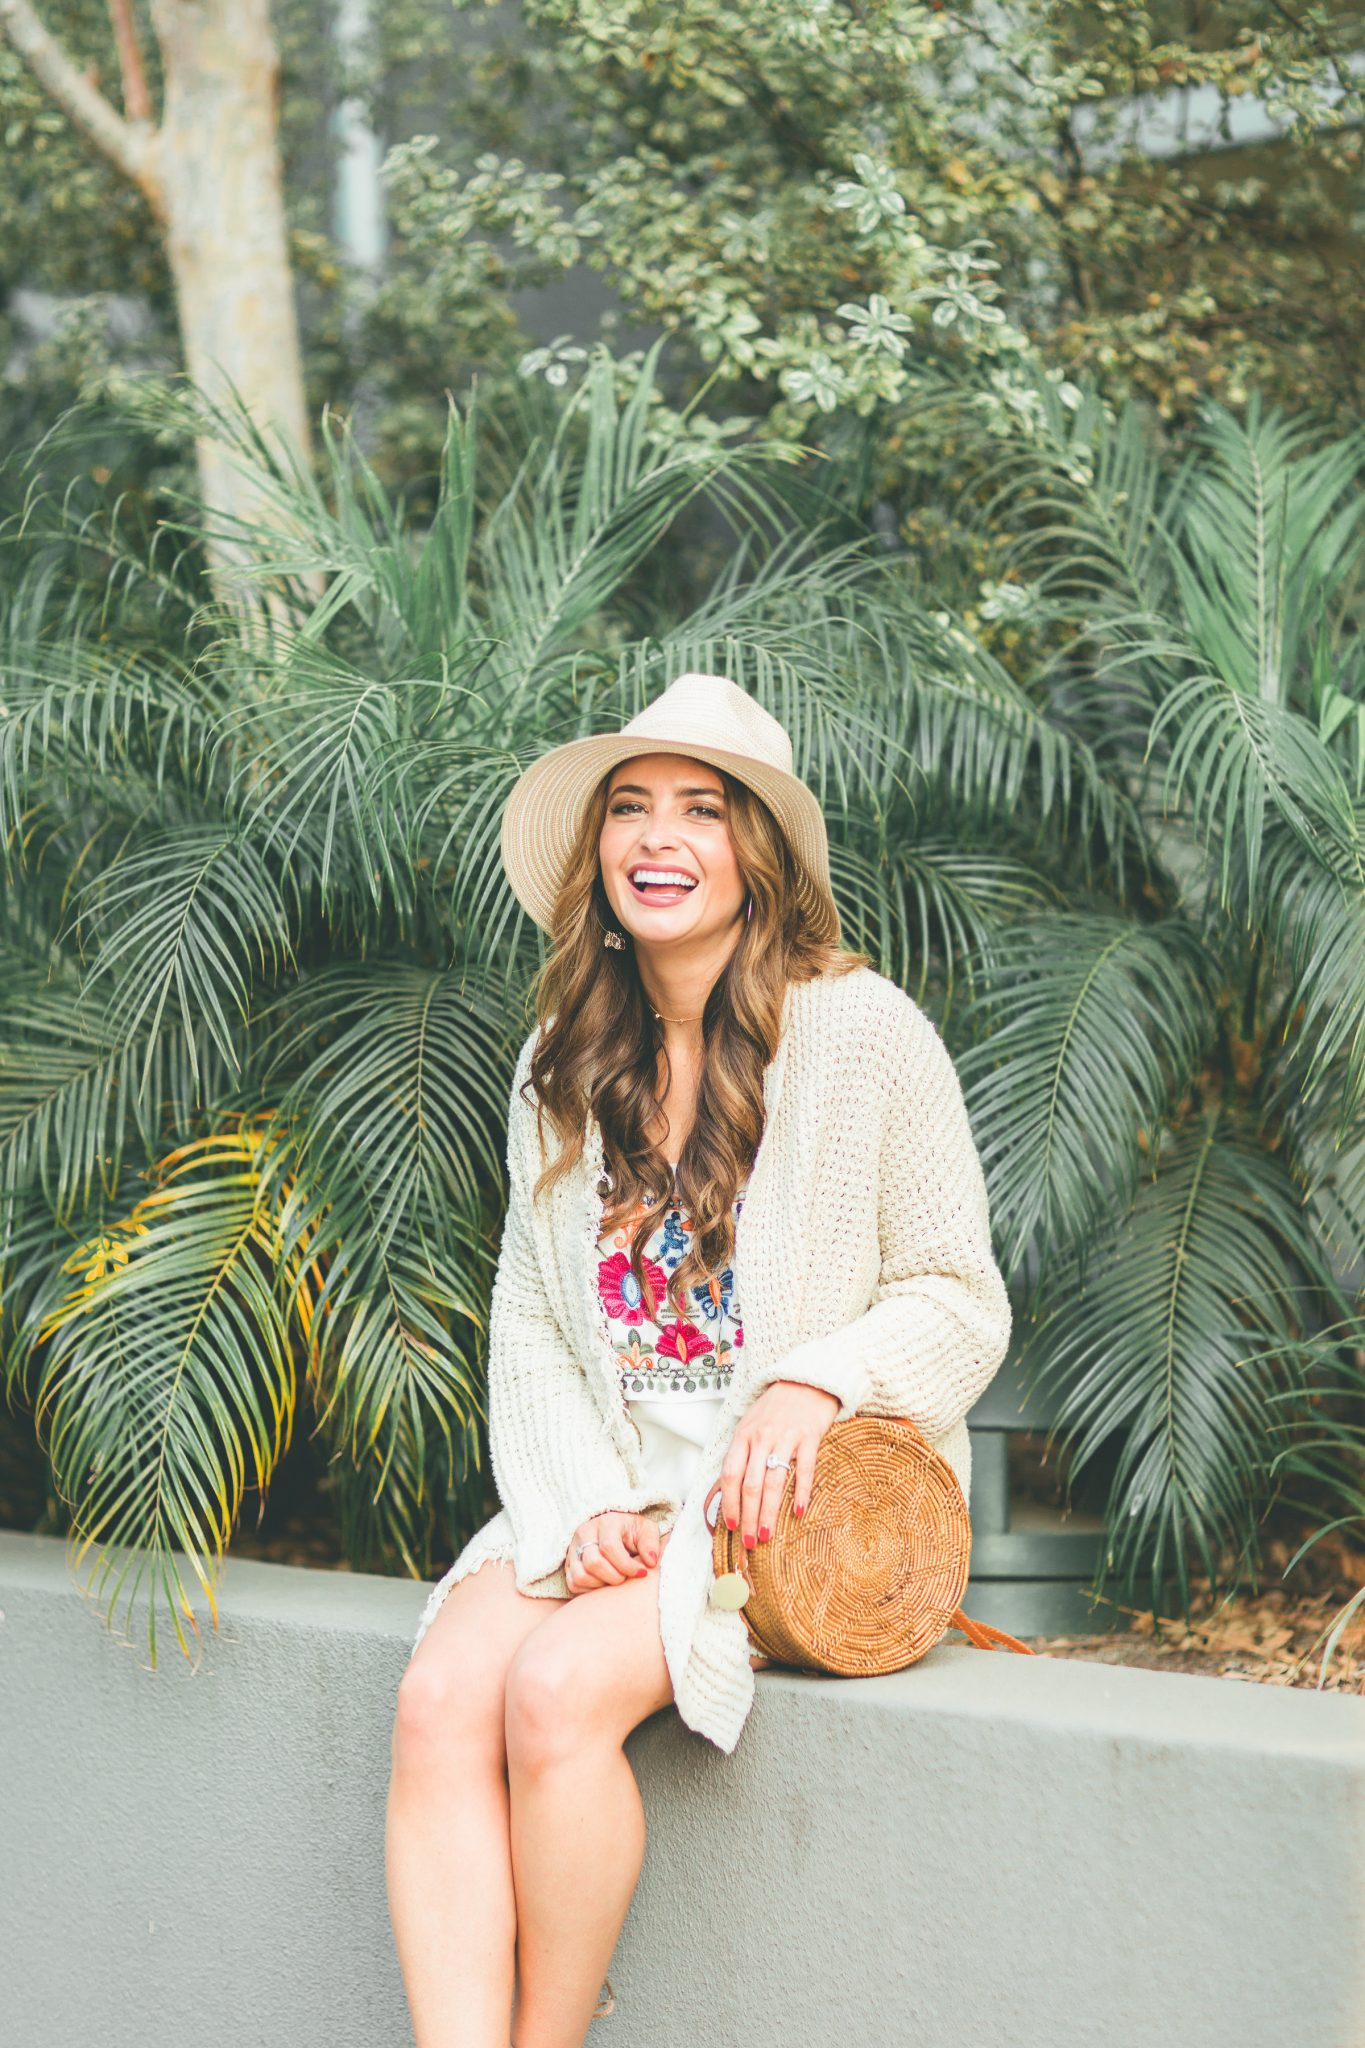 Fun Beach Look by popular Orange County style blogger Maxie Elle